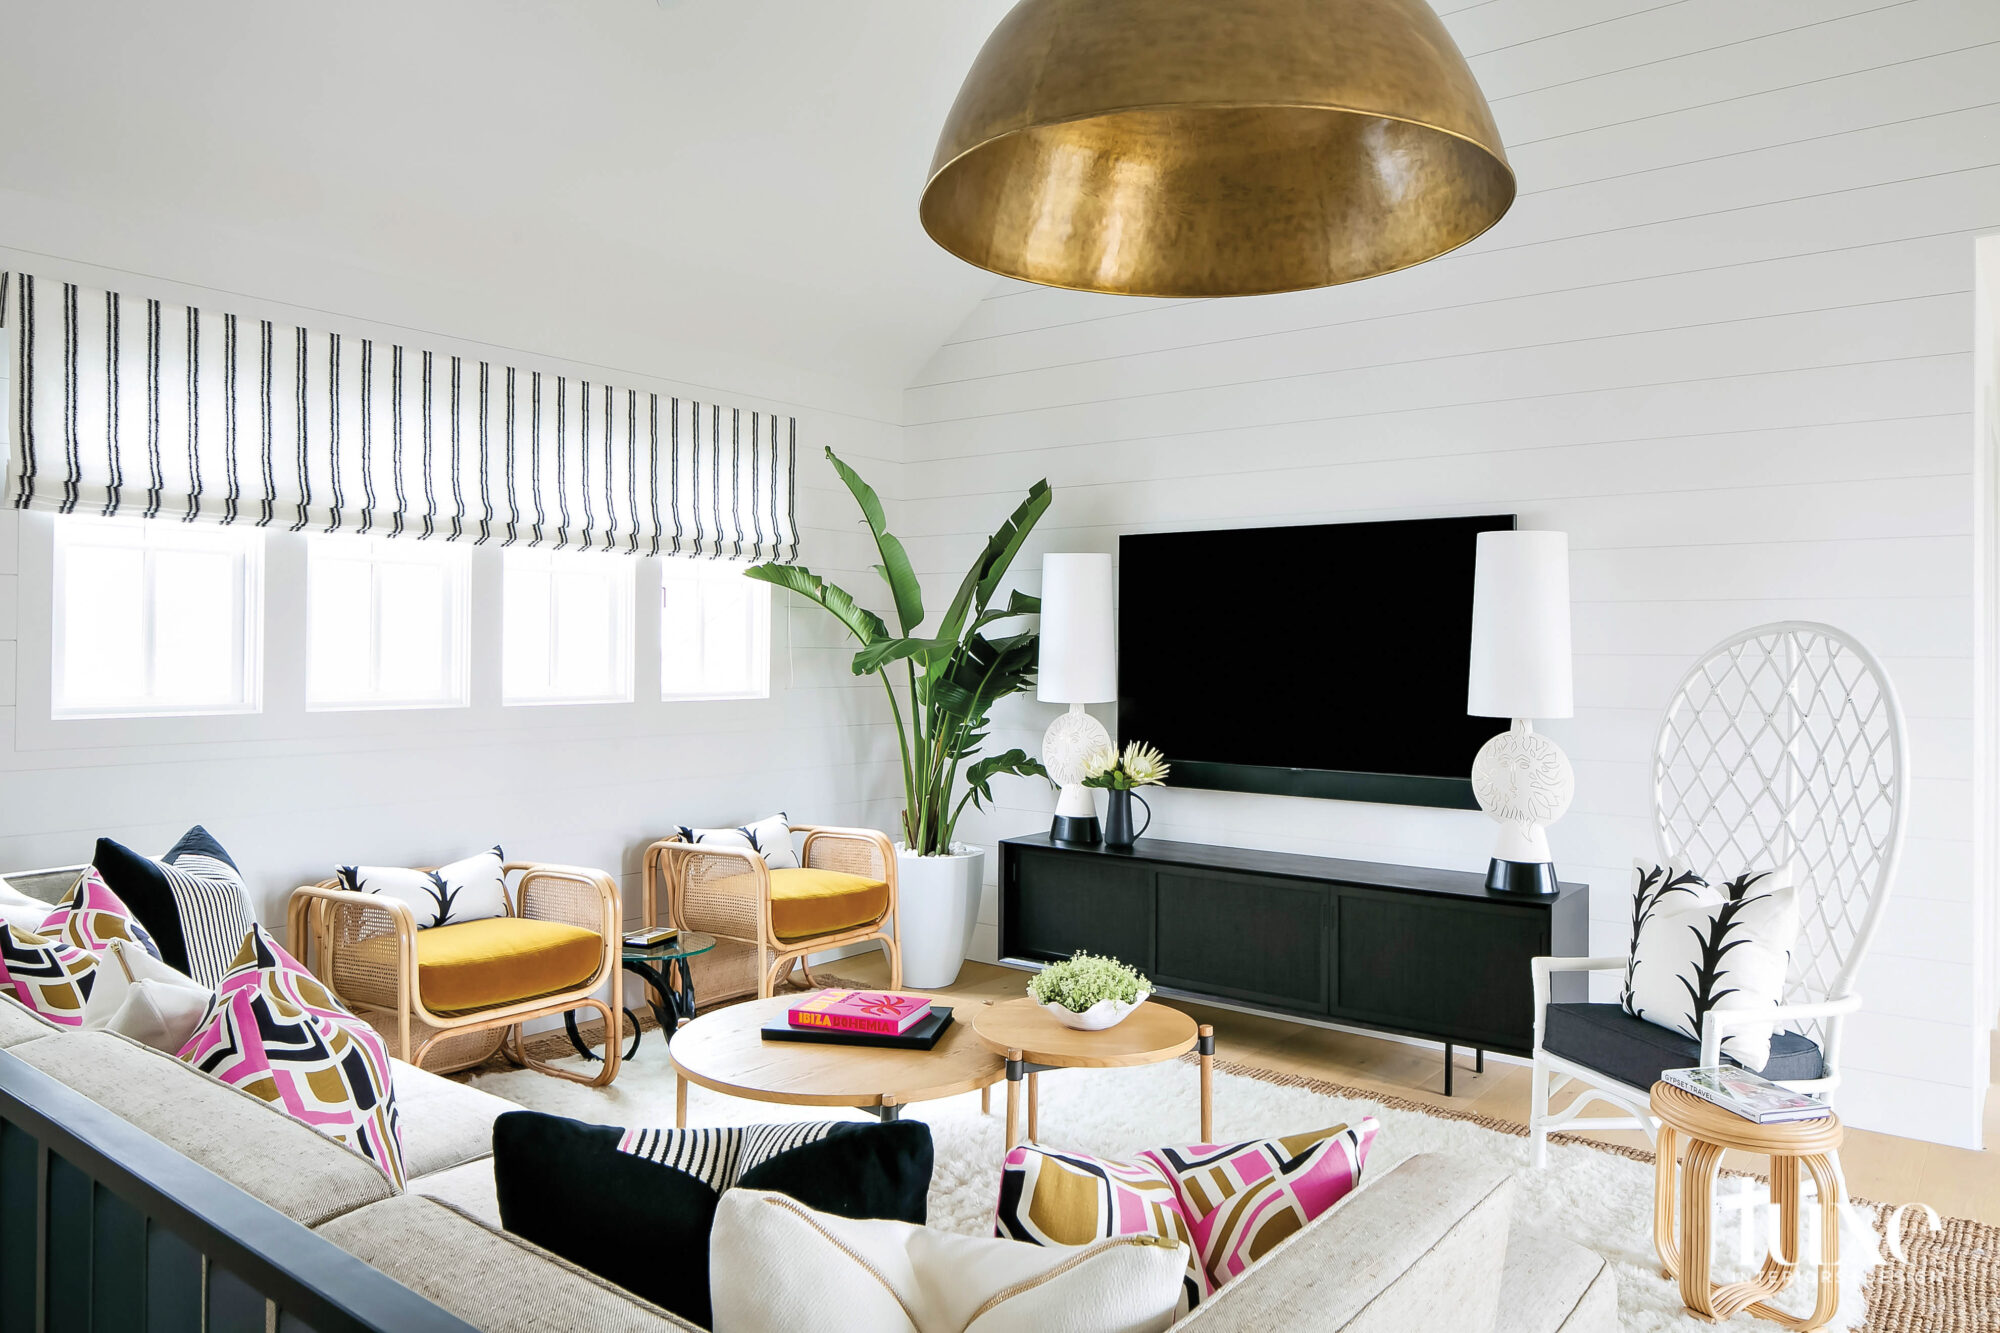 Den with gold overhead fixture...